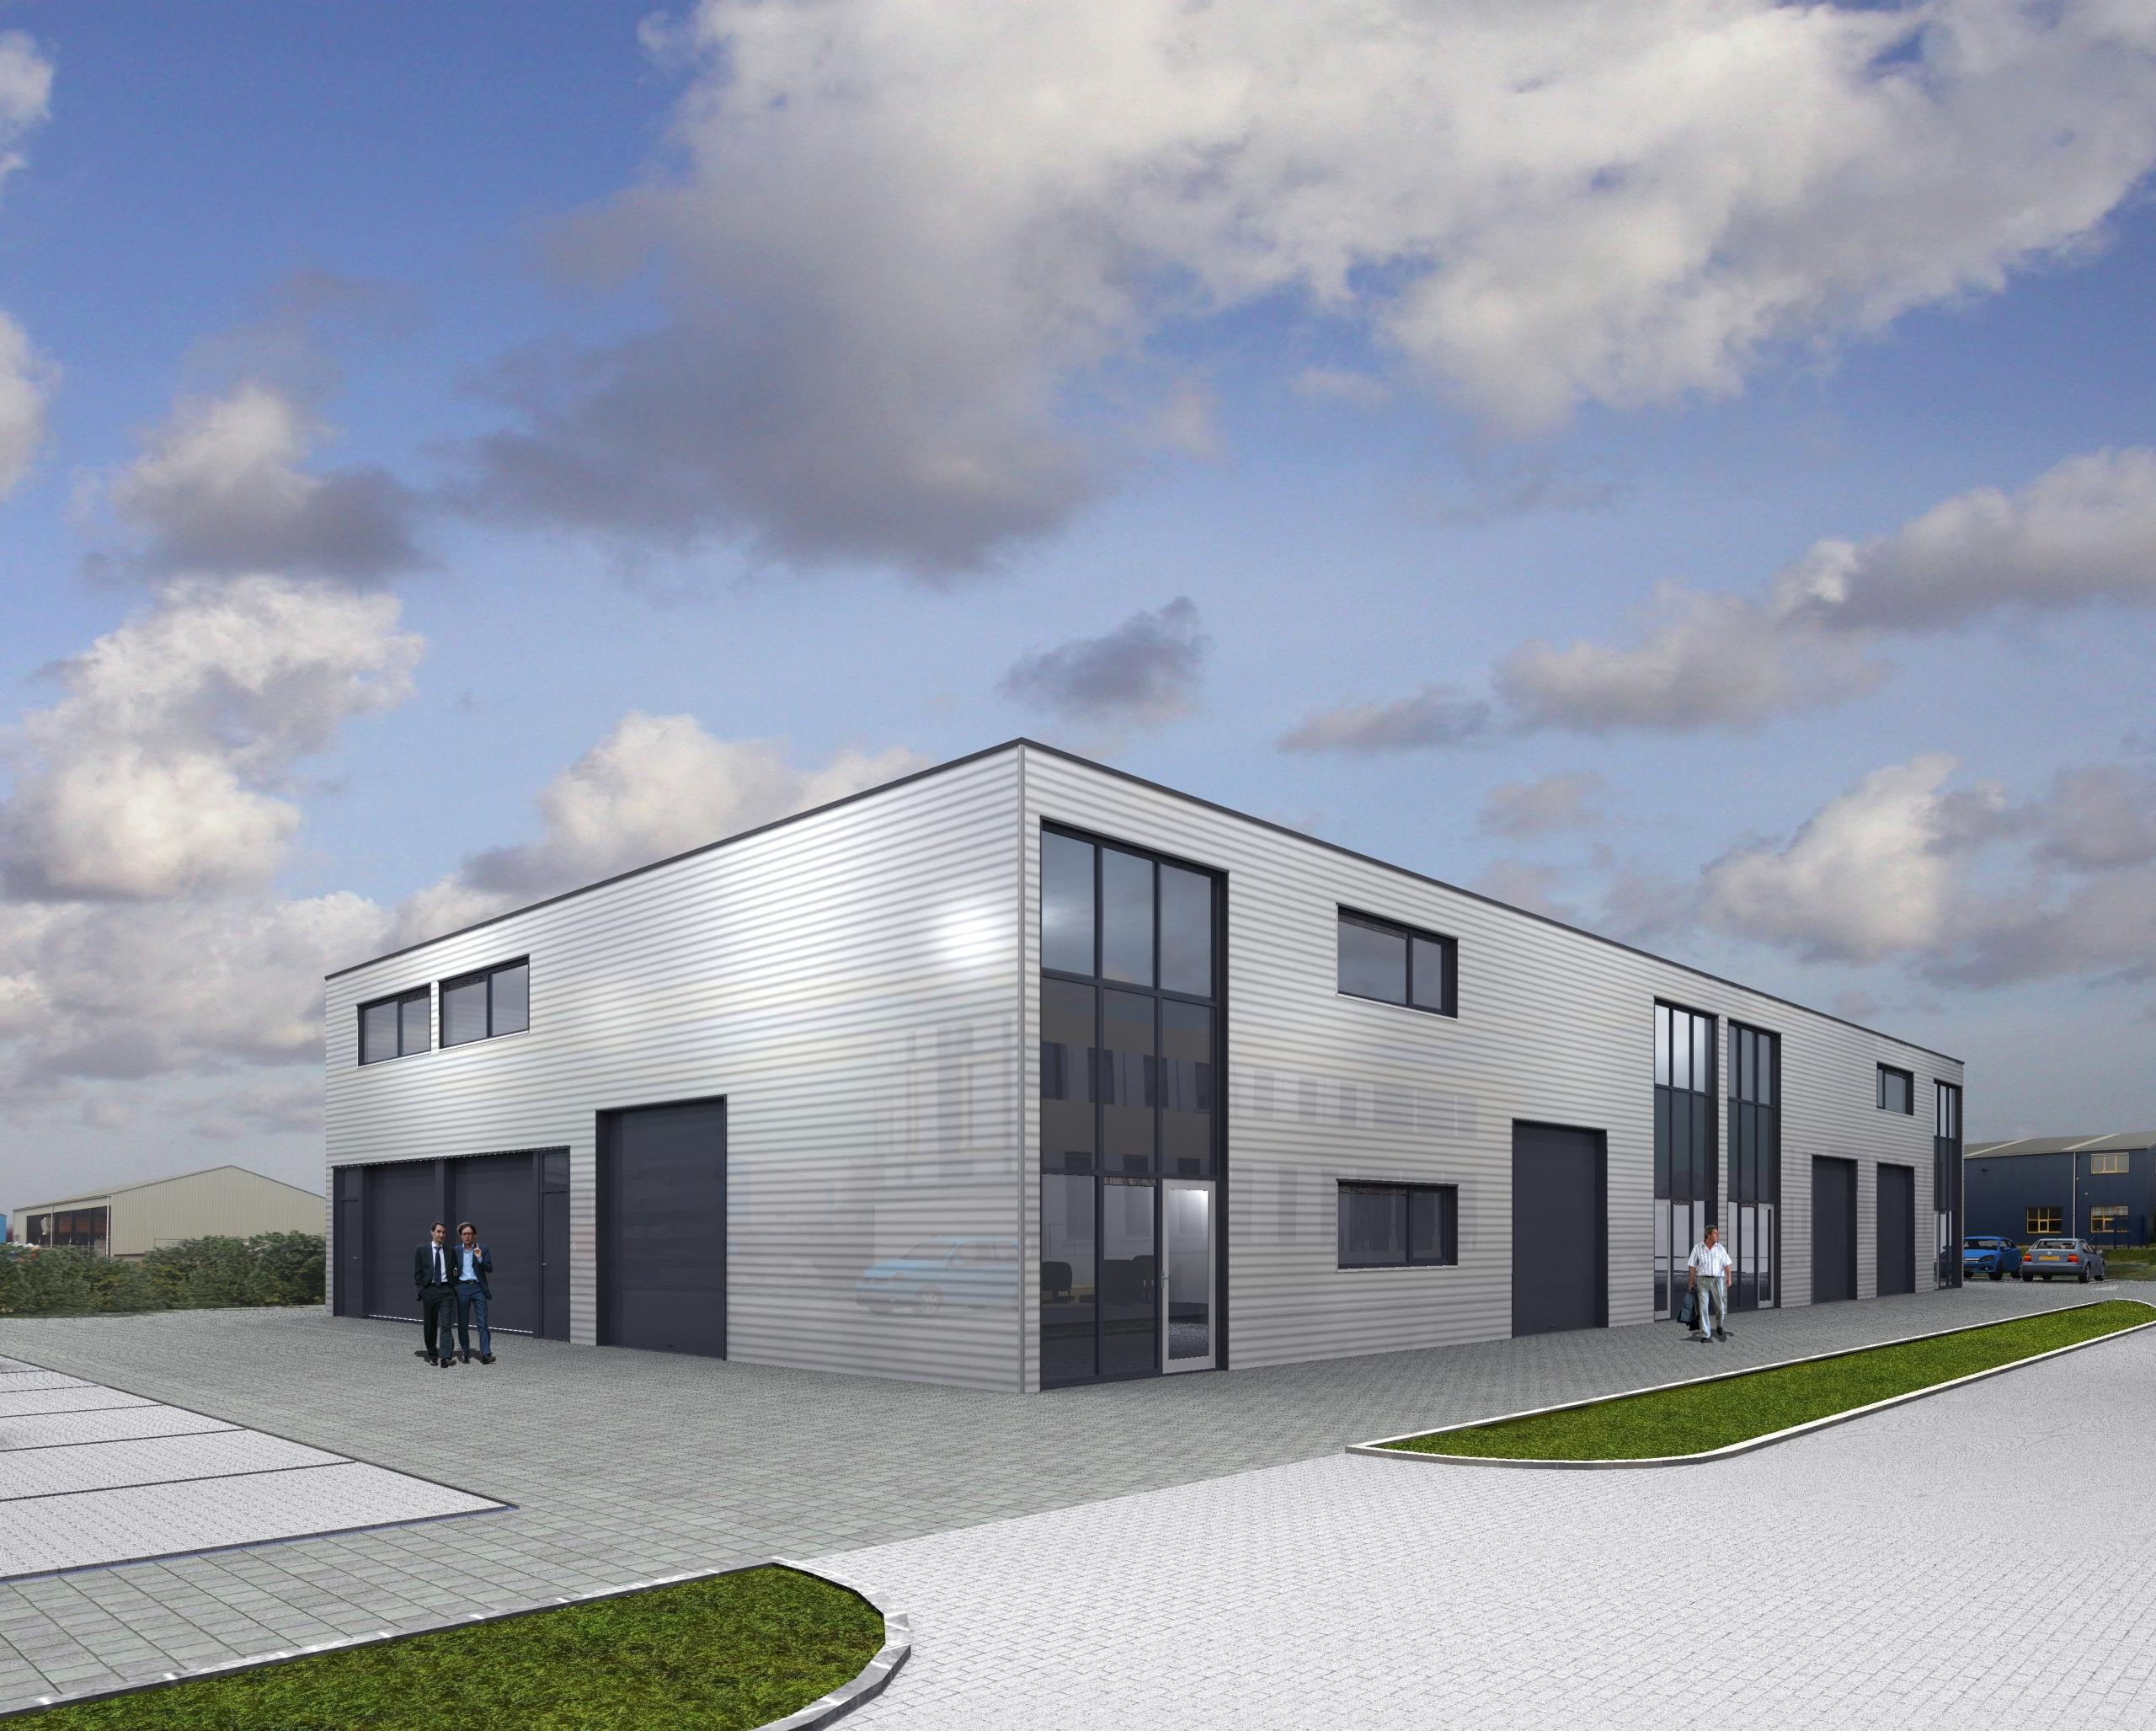 Unit Plaza Hem - Schadenberg Projectontwikkeling